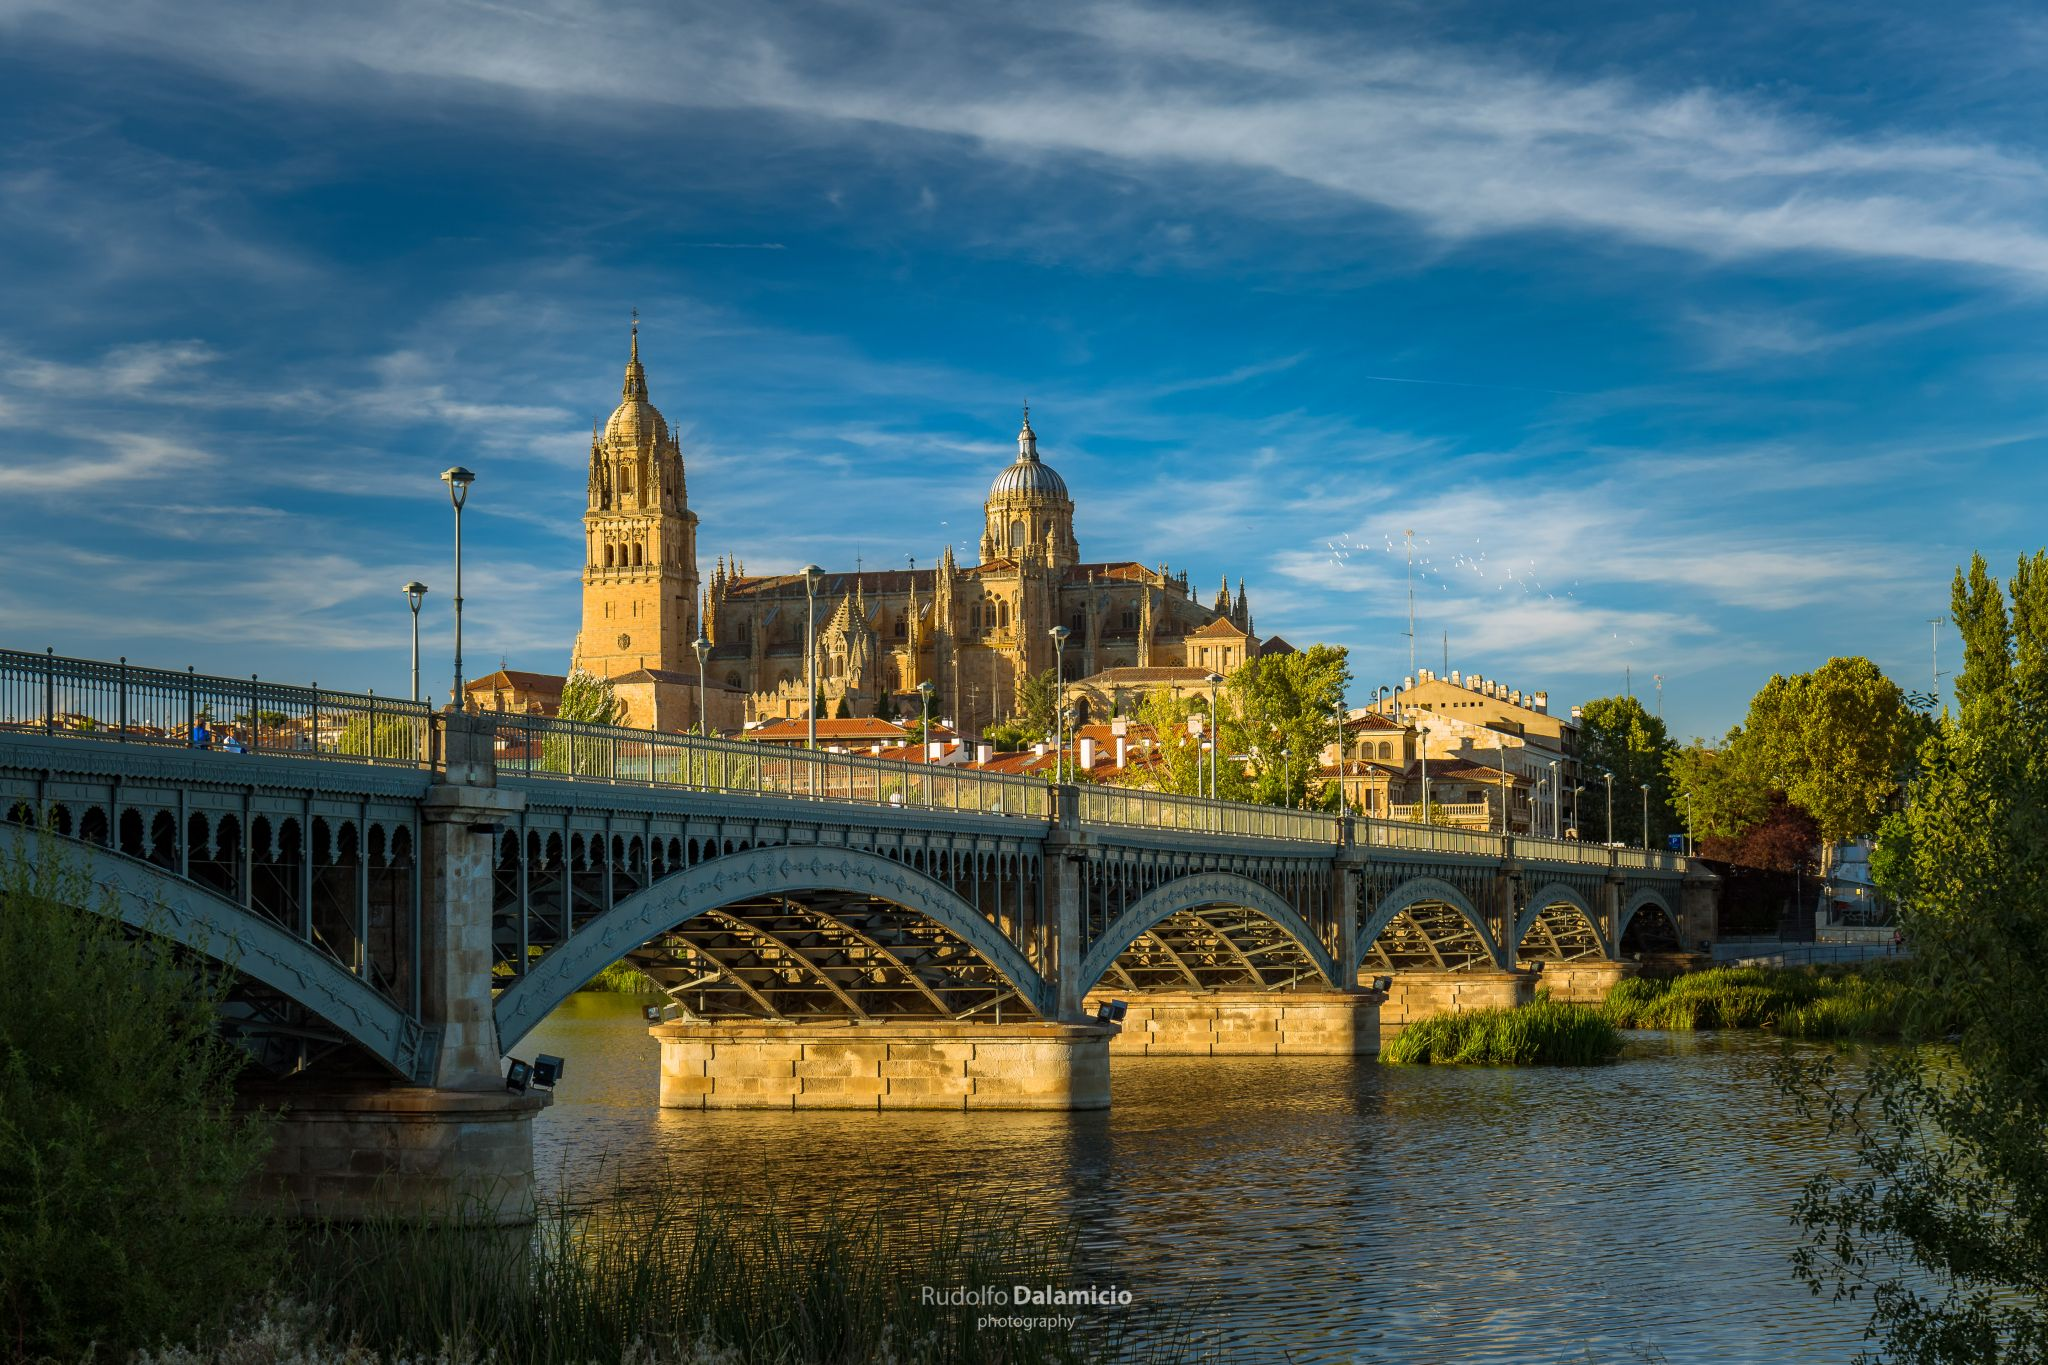 Cathedral de Salamanca, Spain